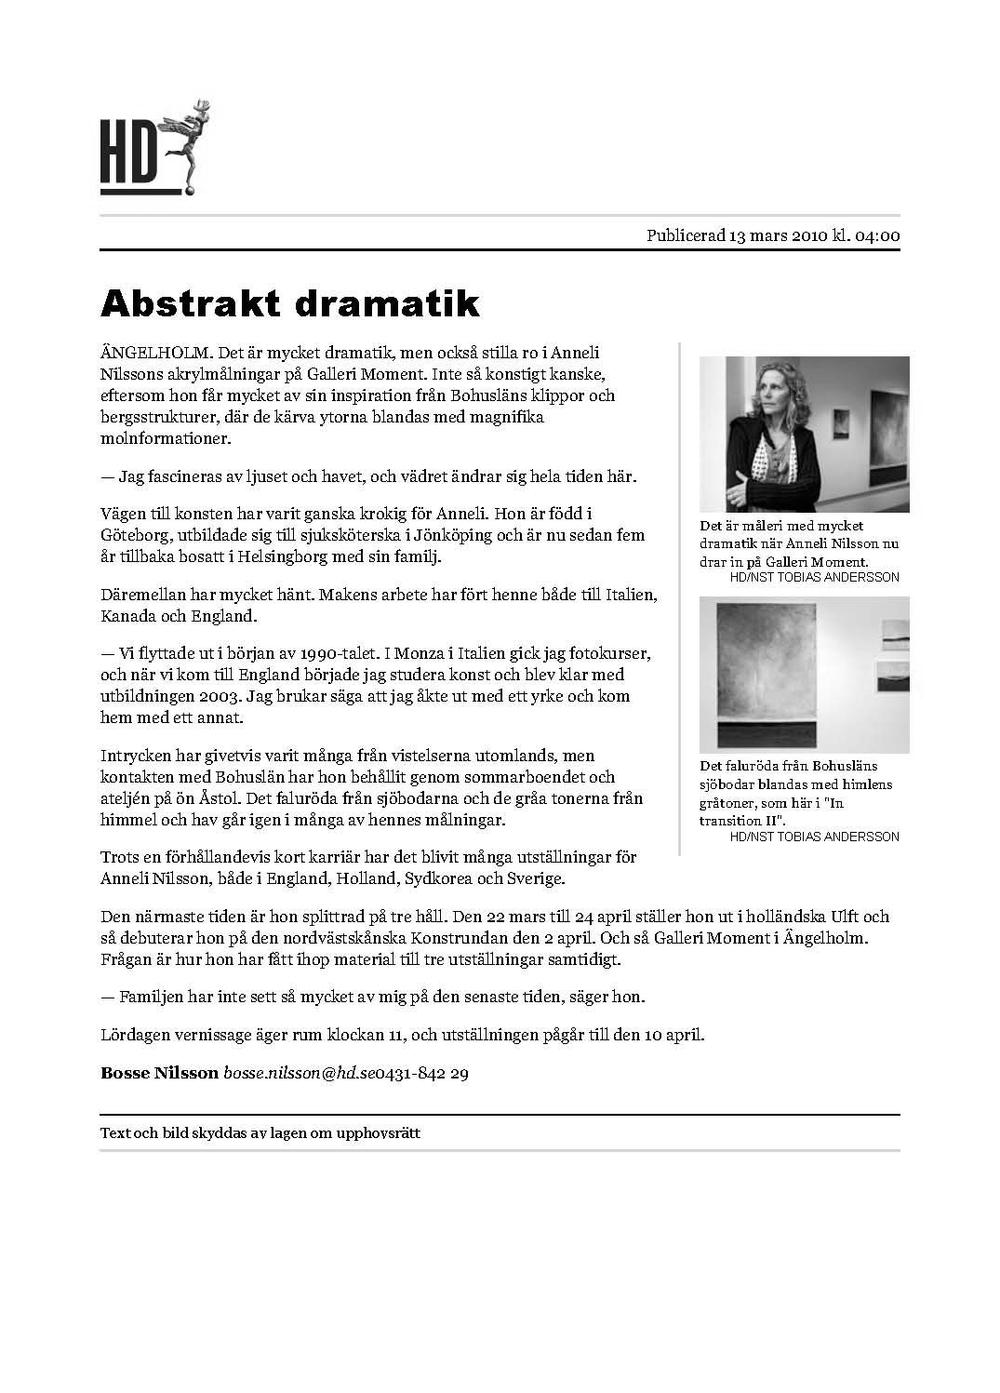 Abstrakt dramatik - hd.se.jpg